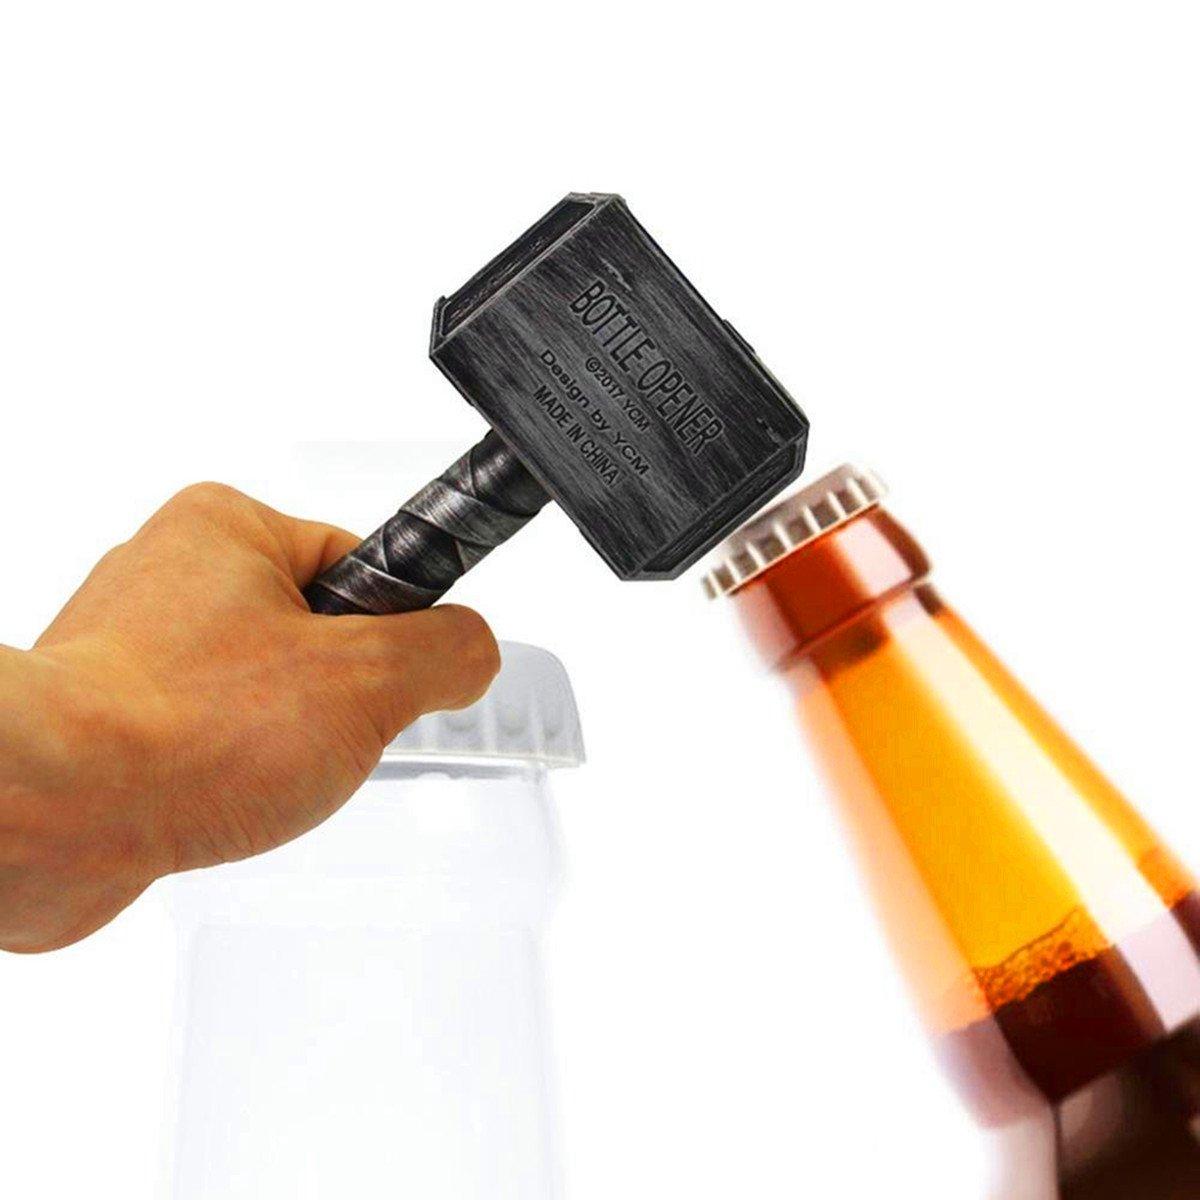 Huaup Bottle Opener, Beer Opener - Hammer of Thor Shaped Beer Bottle Opener, Corkscrew Beverage Wrench, Easy to Use Best Bottle Openers (Mjolnir Silver)